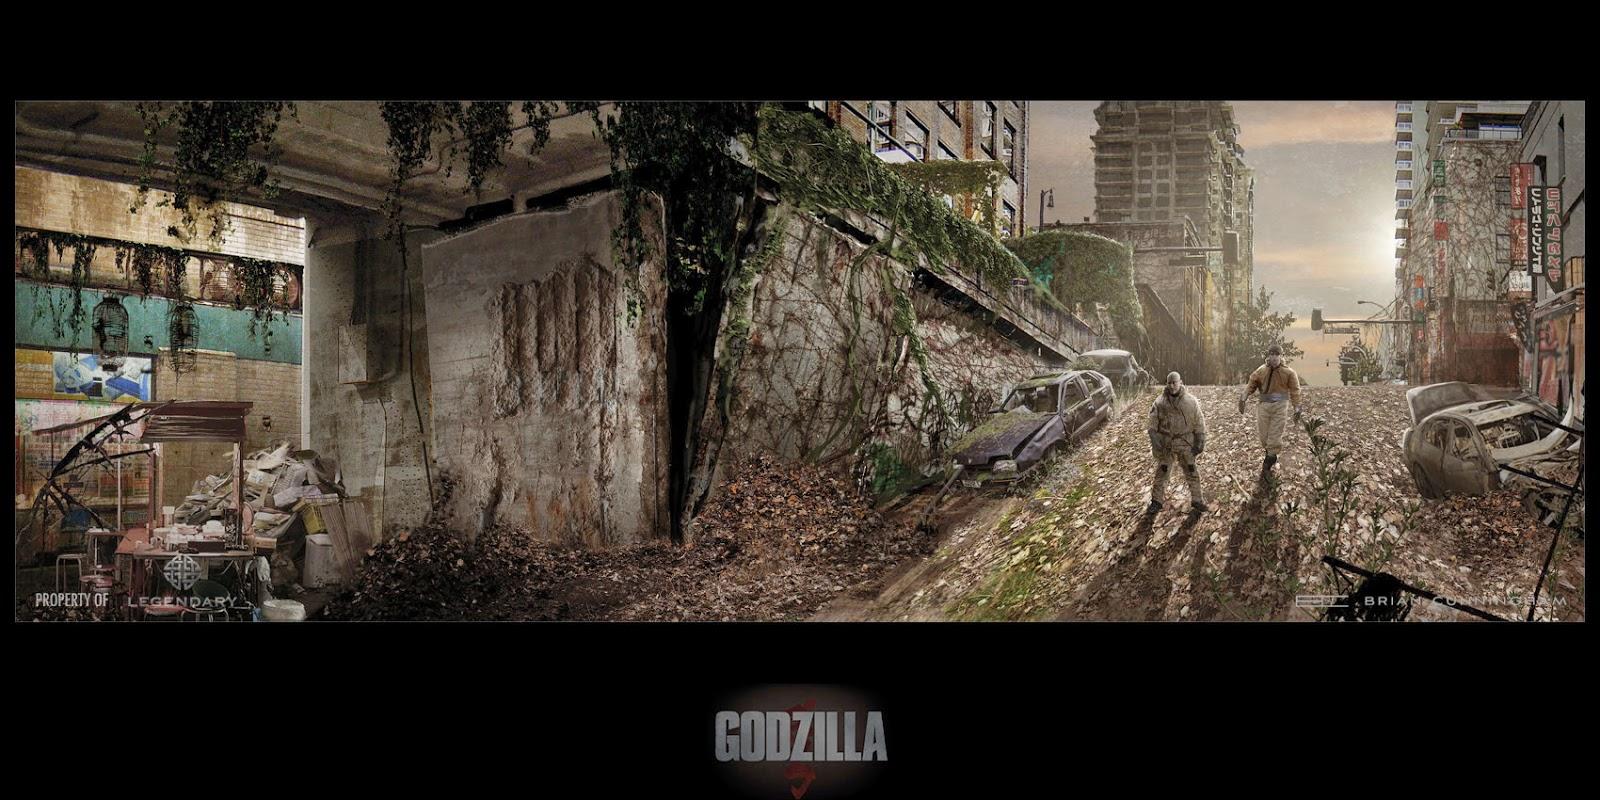 godzilla concept arts cg daily news